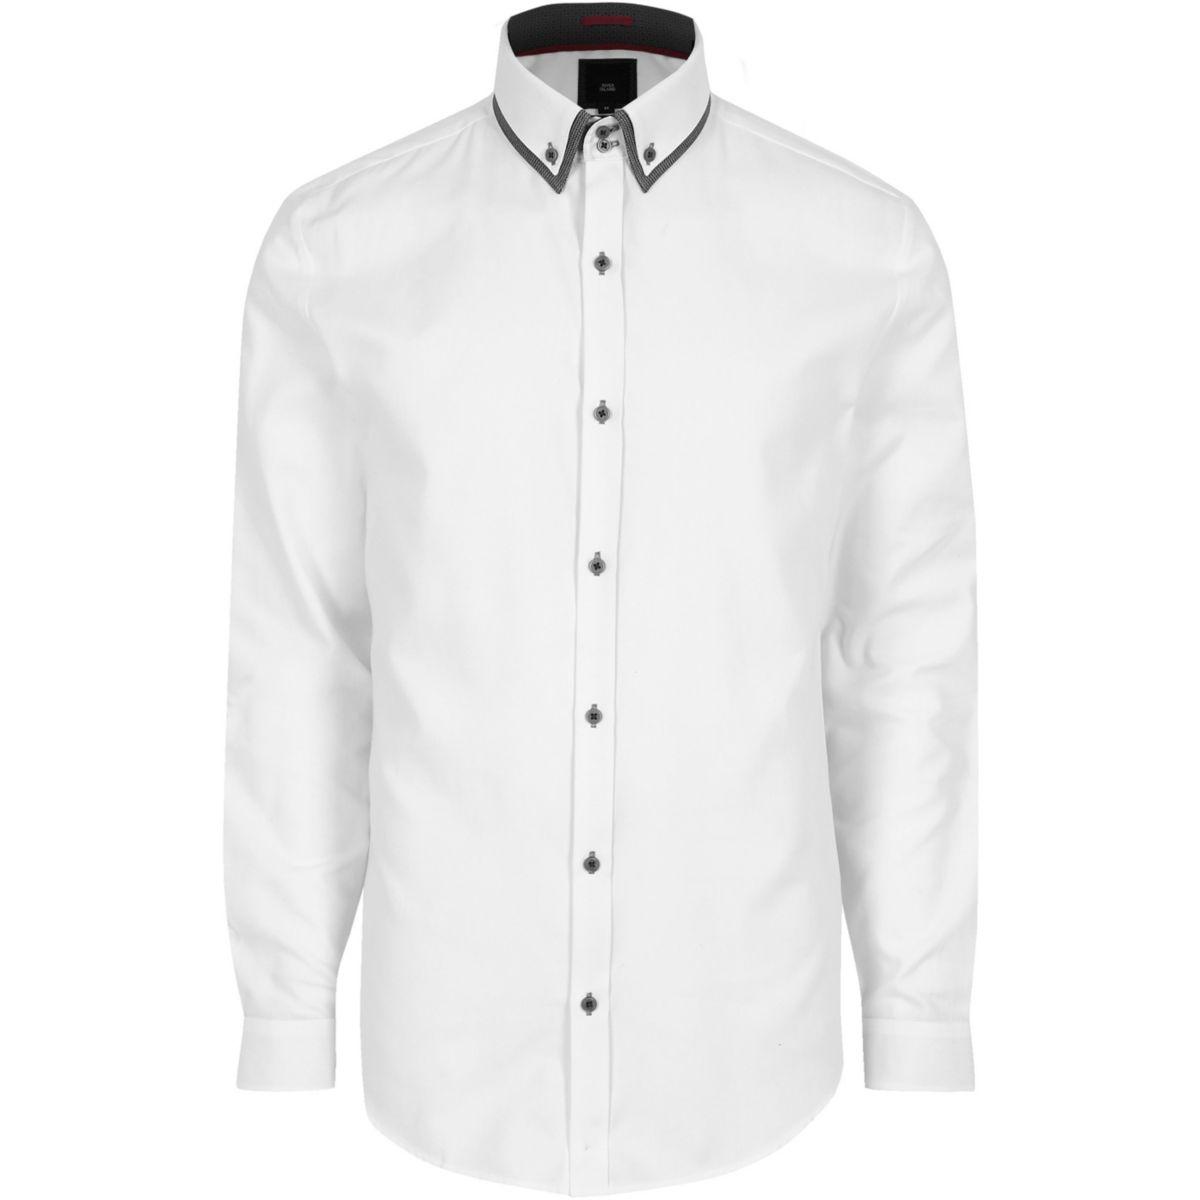 RI Big and Tall - Wit overhemd met dubbele kraag